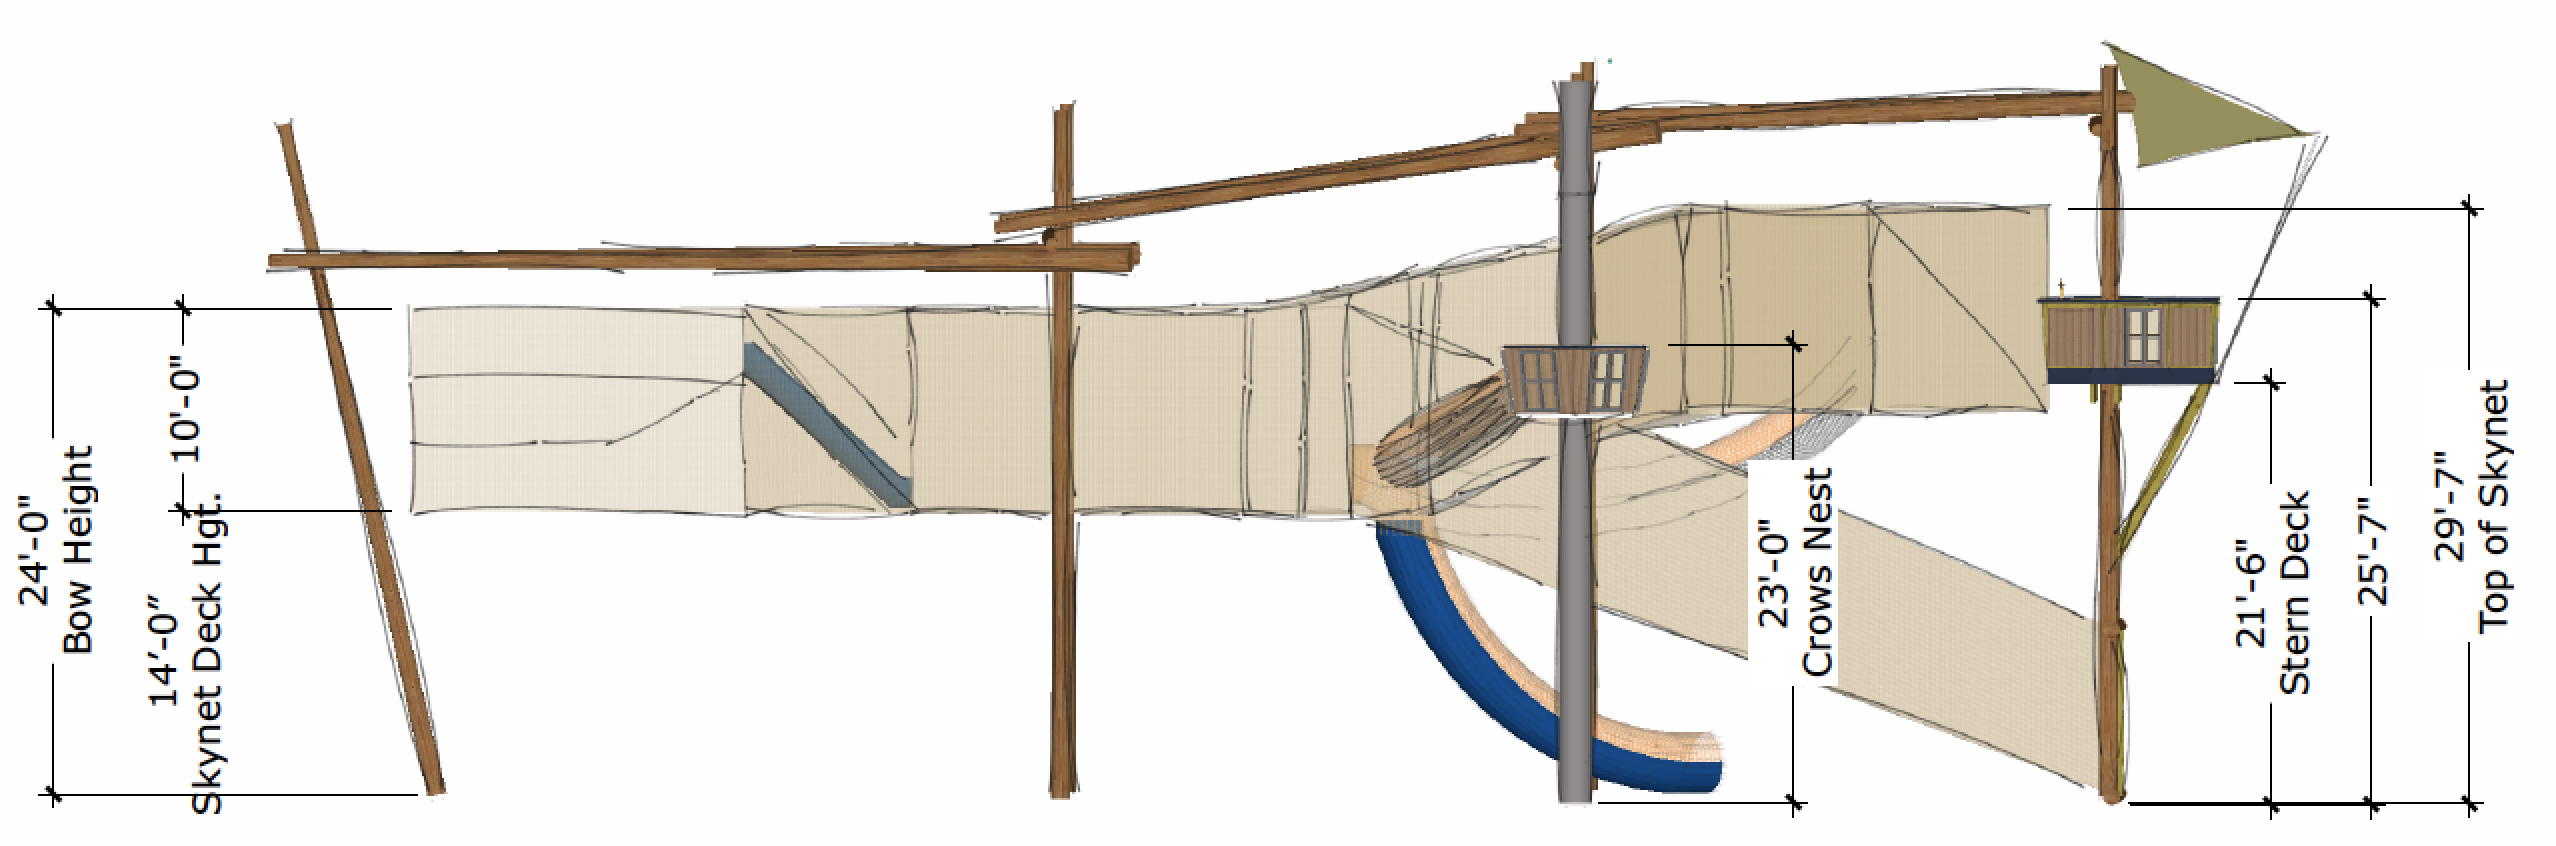 Skynet course blueprint with measurements.